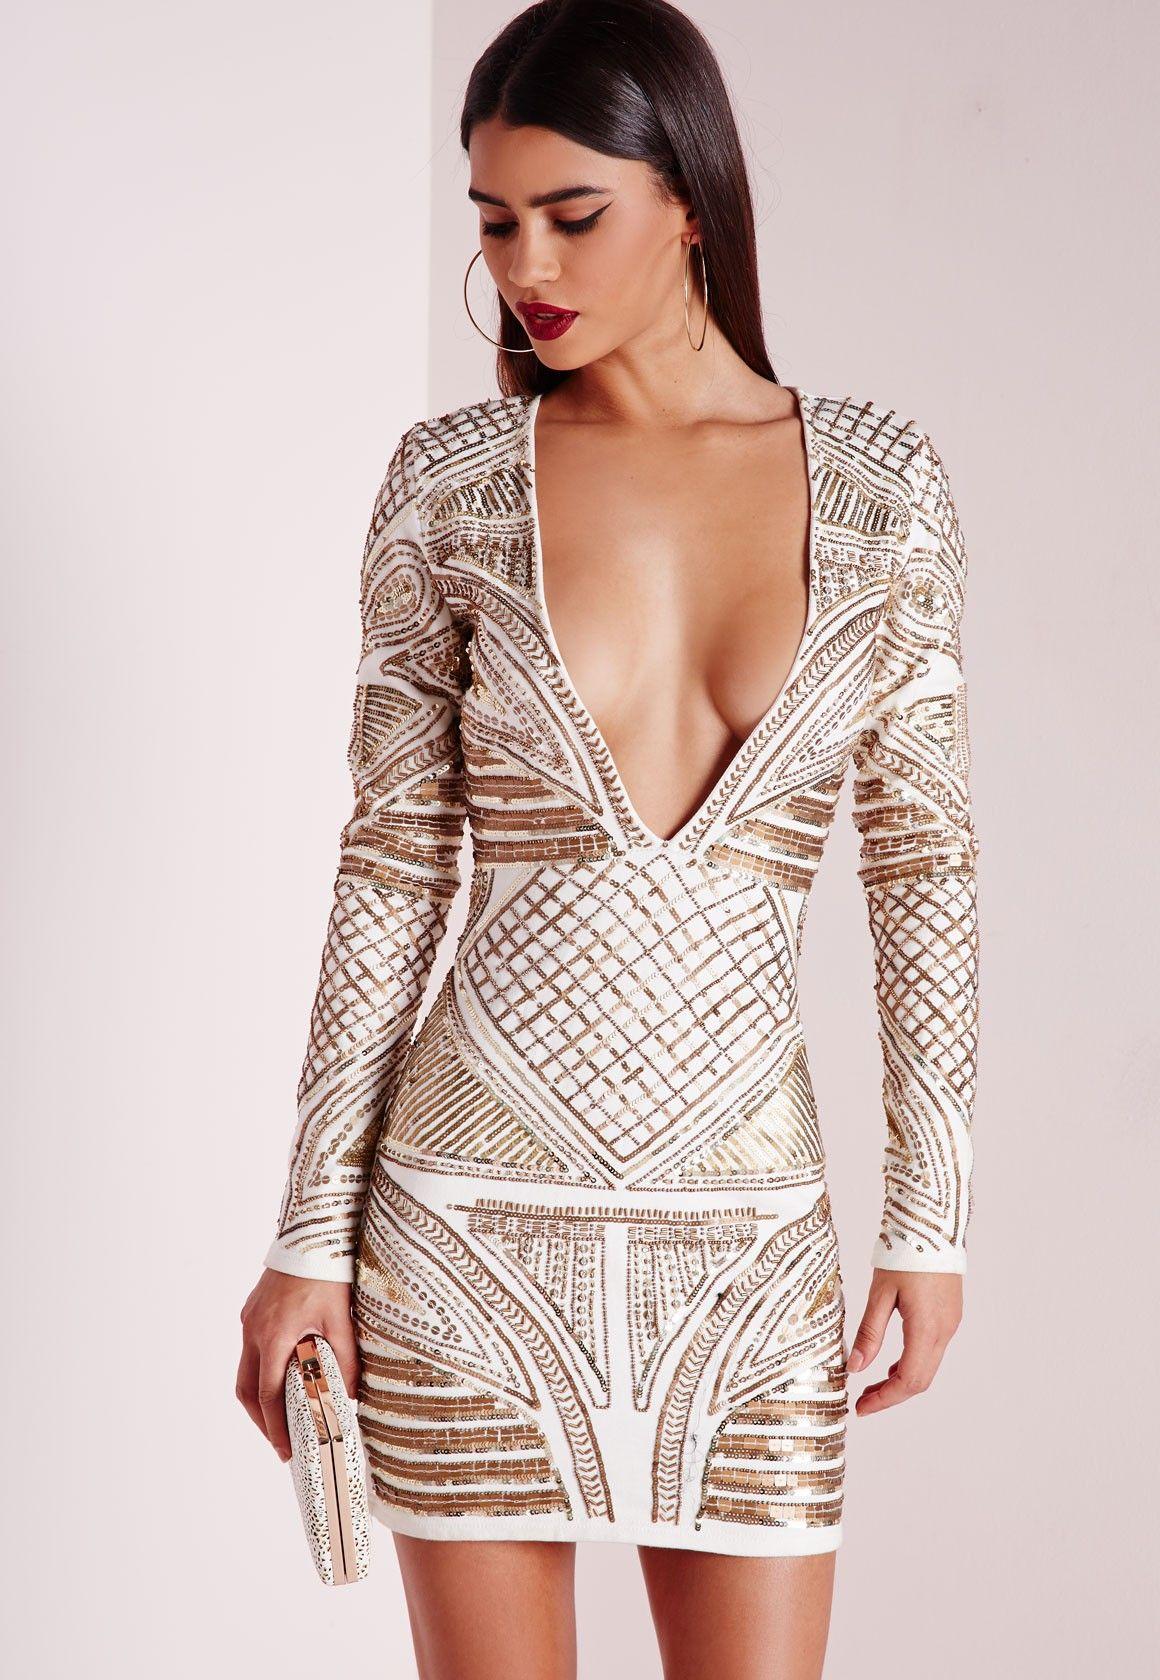 Cheap night out dresses uk